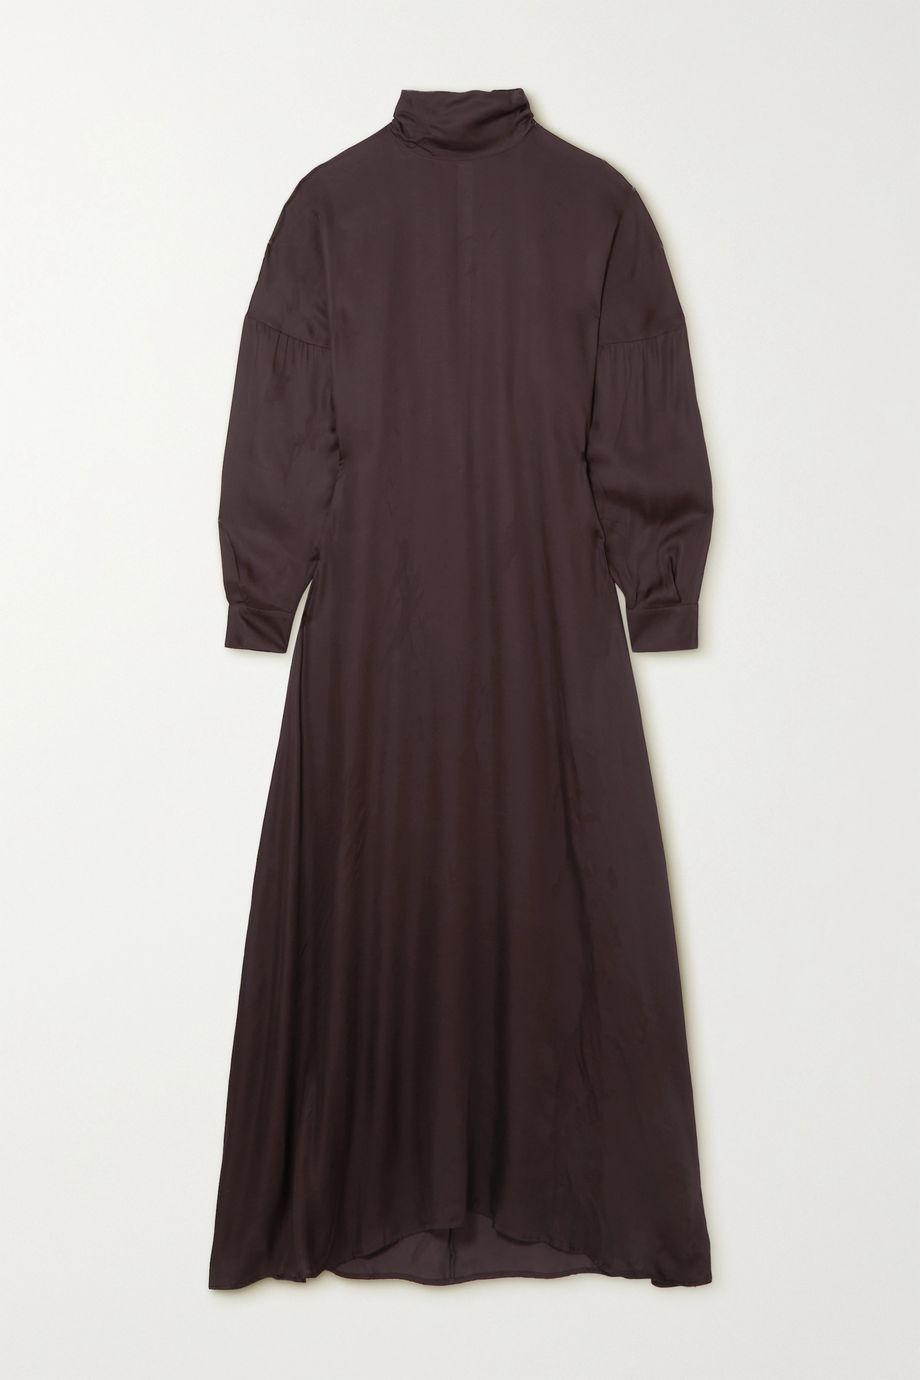 BITE Studios + NET SUSTAIN woven turtleneck midi dress